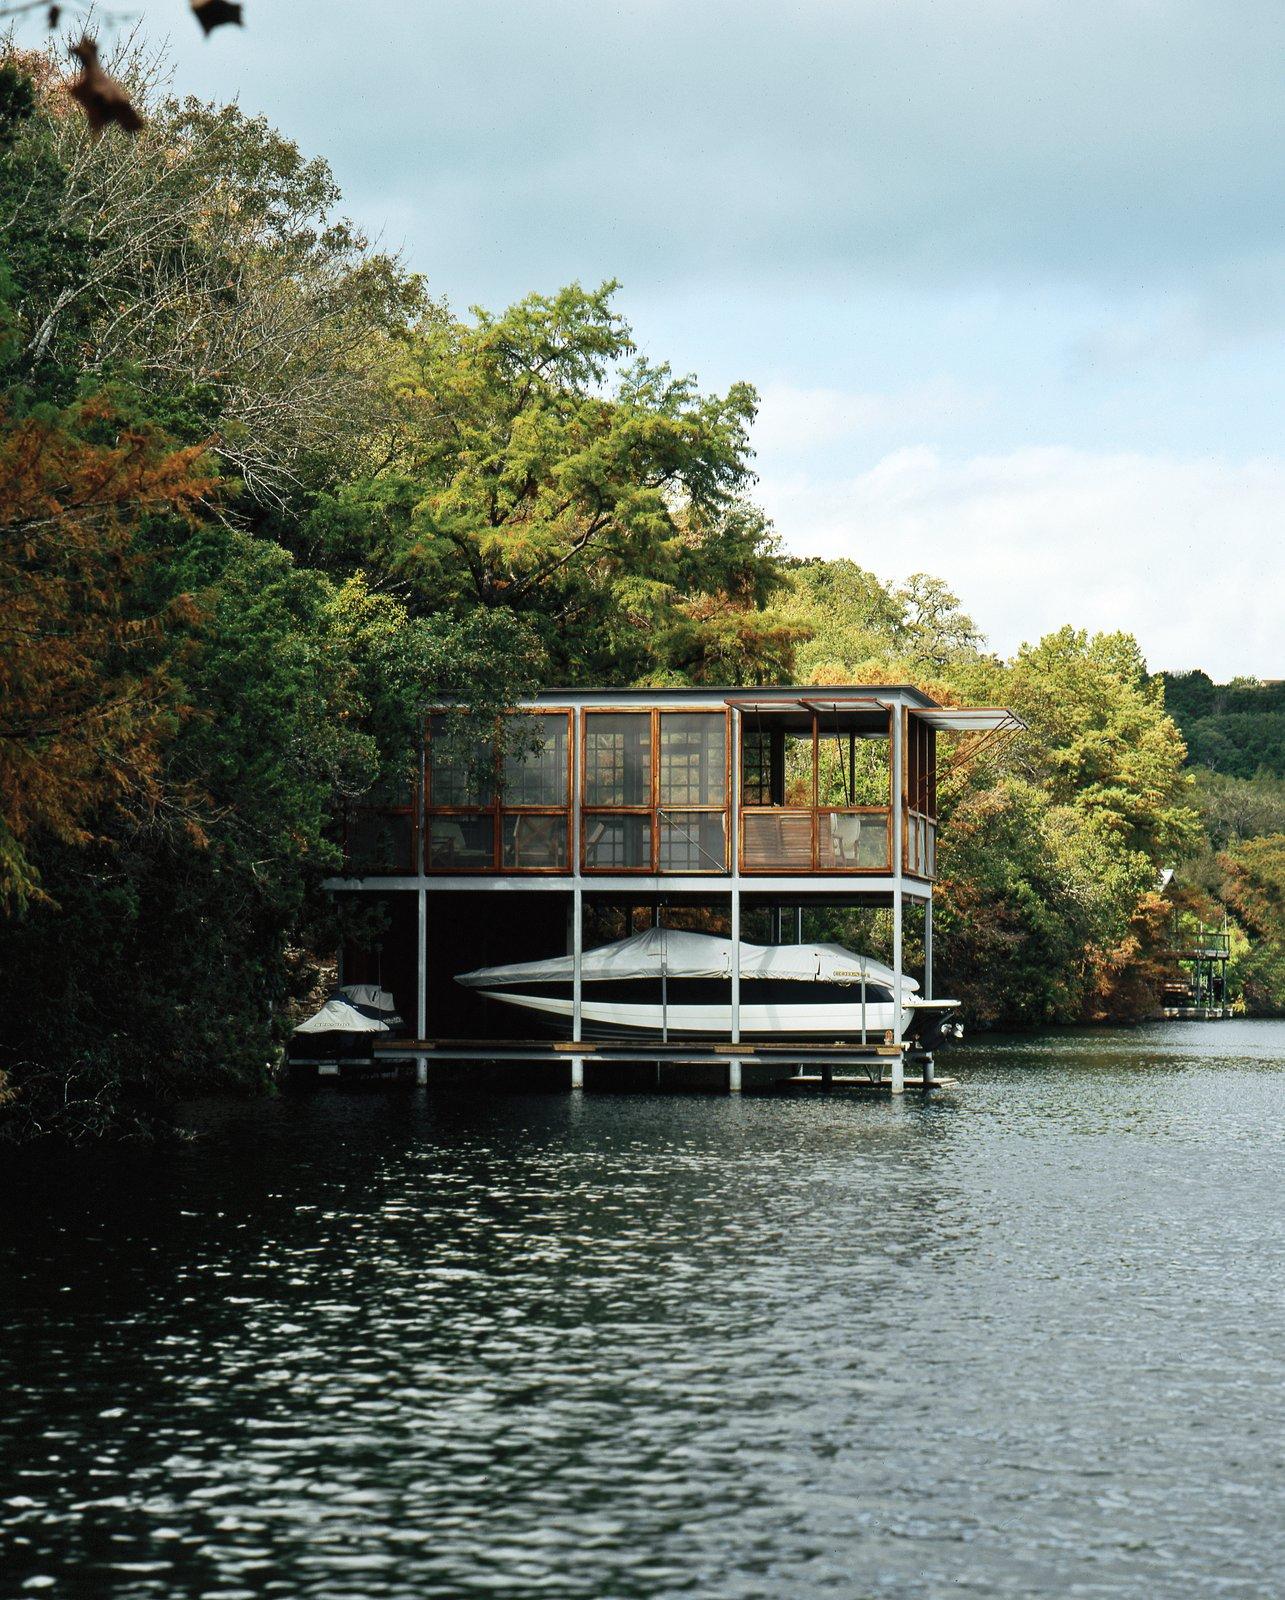 #outdoor #boathouse #lake #Texas #prefab #open #green  Photo by Paul Bardagjy  Outdoor